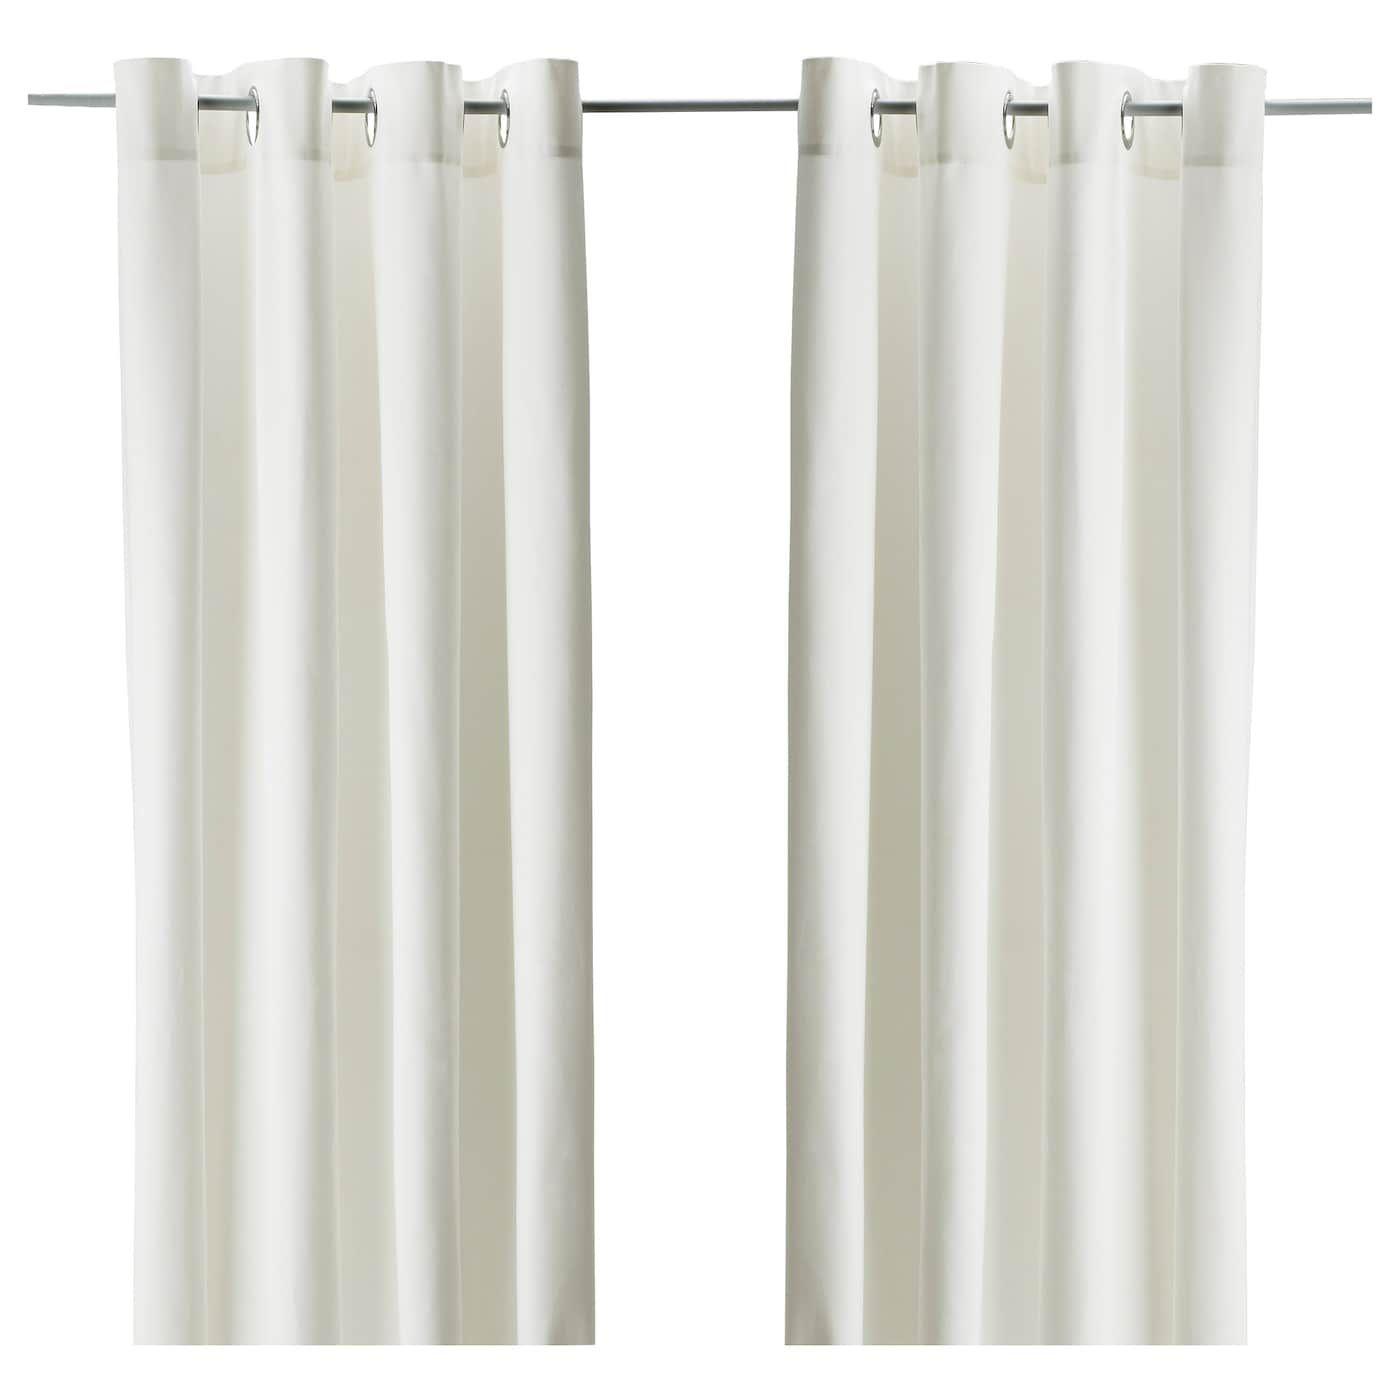 Ikea Merete Bleached White Room Darkening Curtains 1 Pair Room